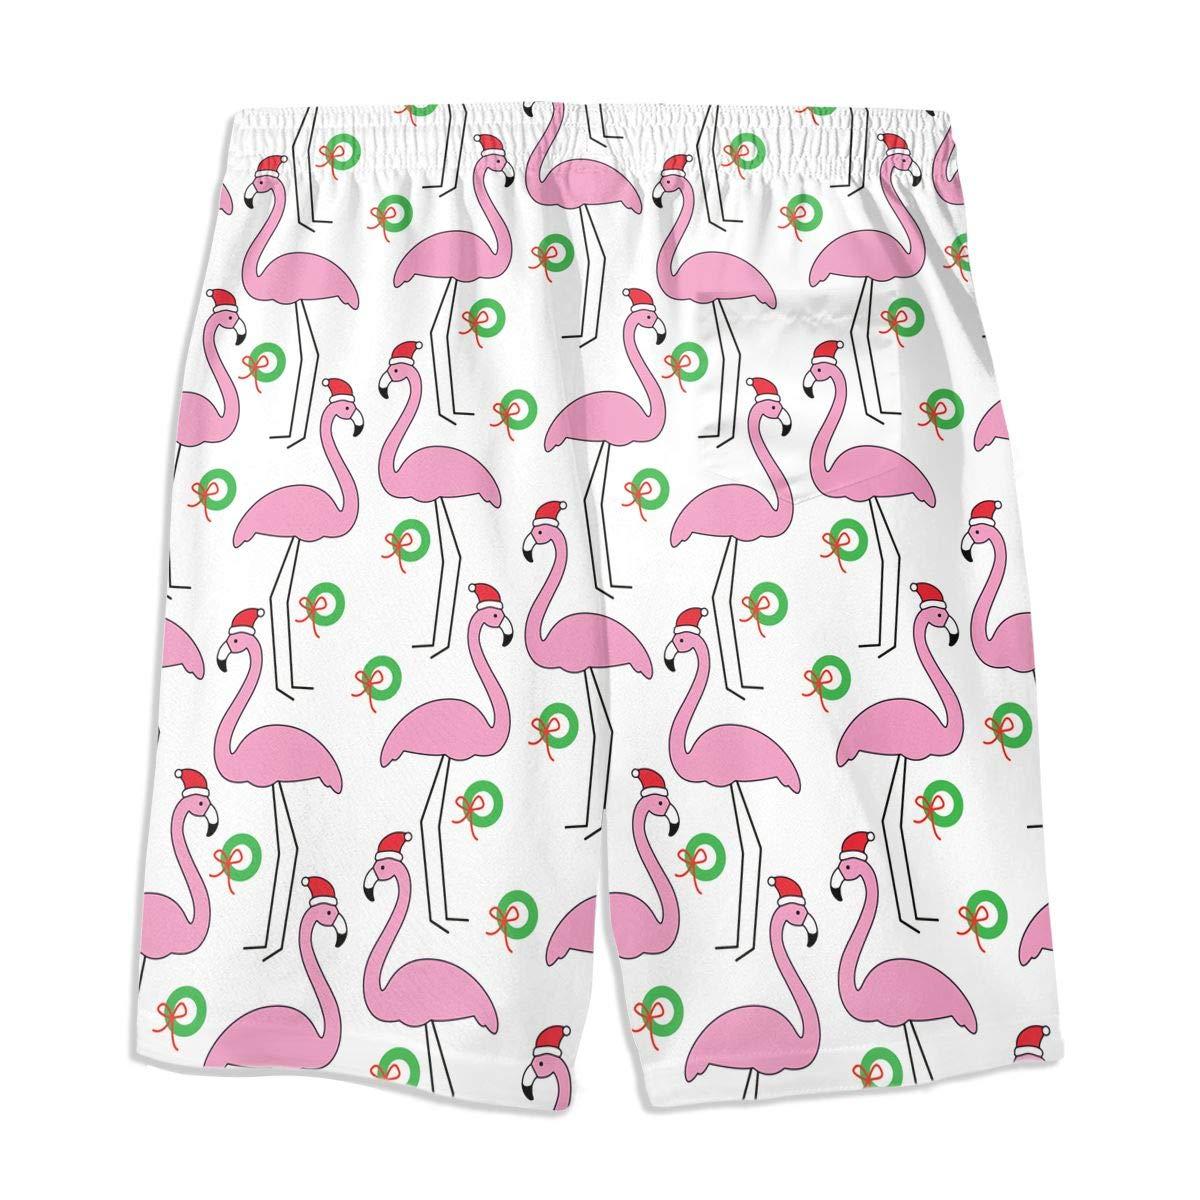 Christmas Hat Fashionable Flamingo Teen Swim Trunks Bathing Suit Shorts Board Beach